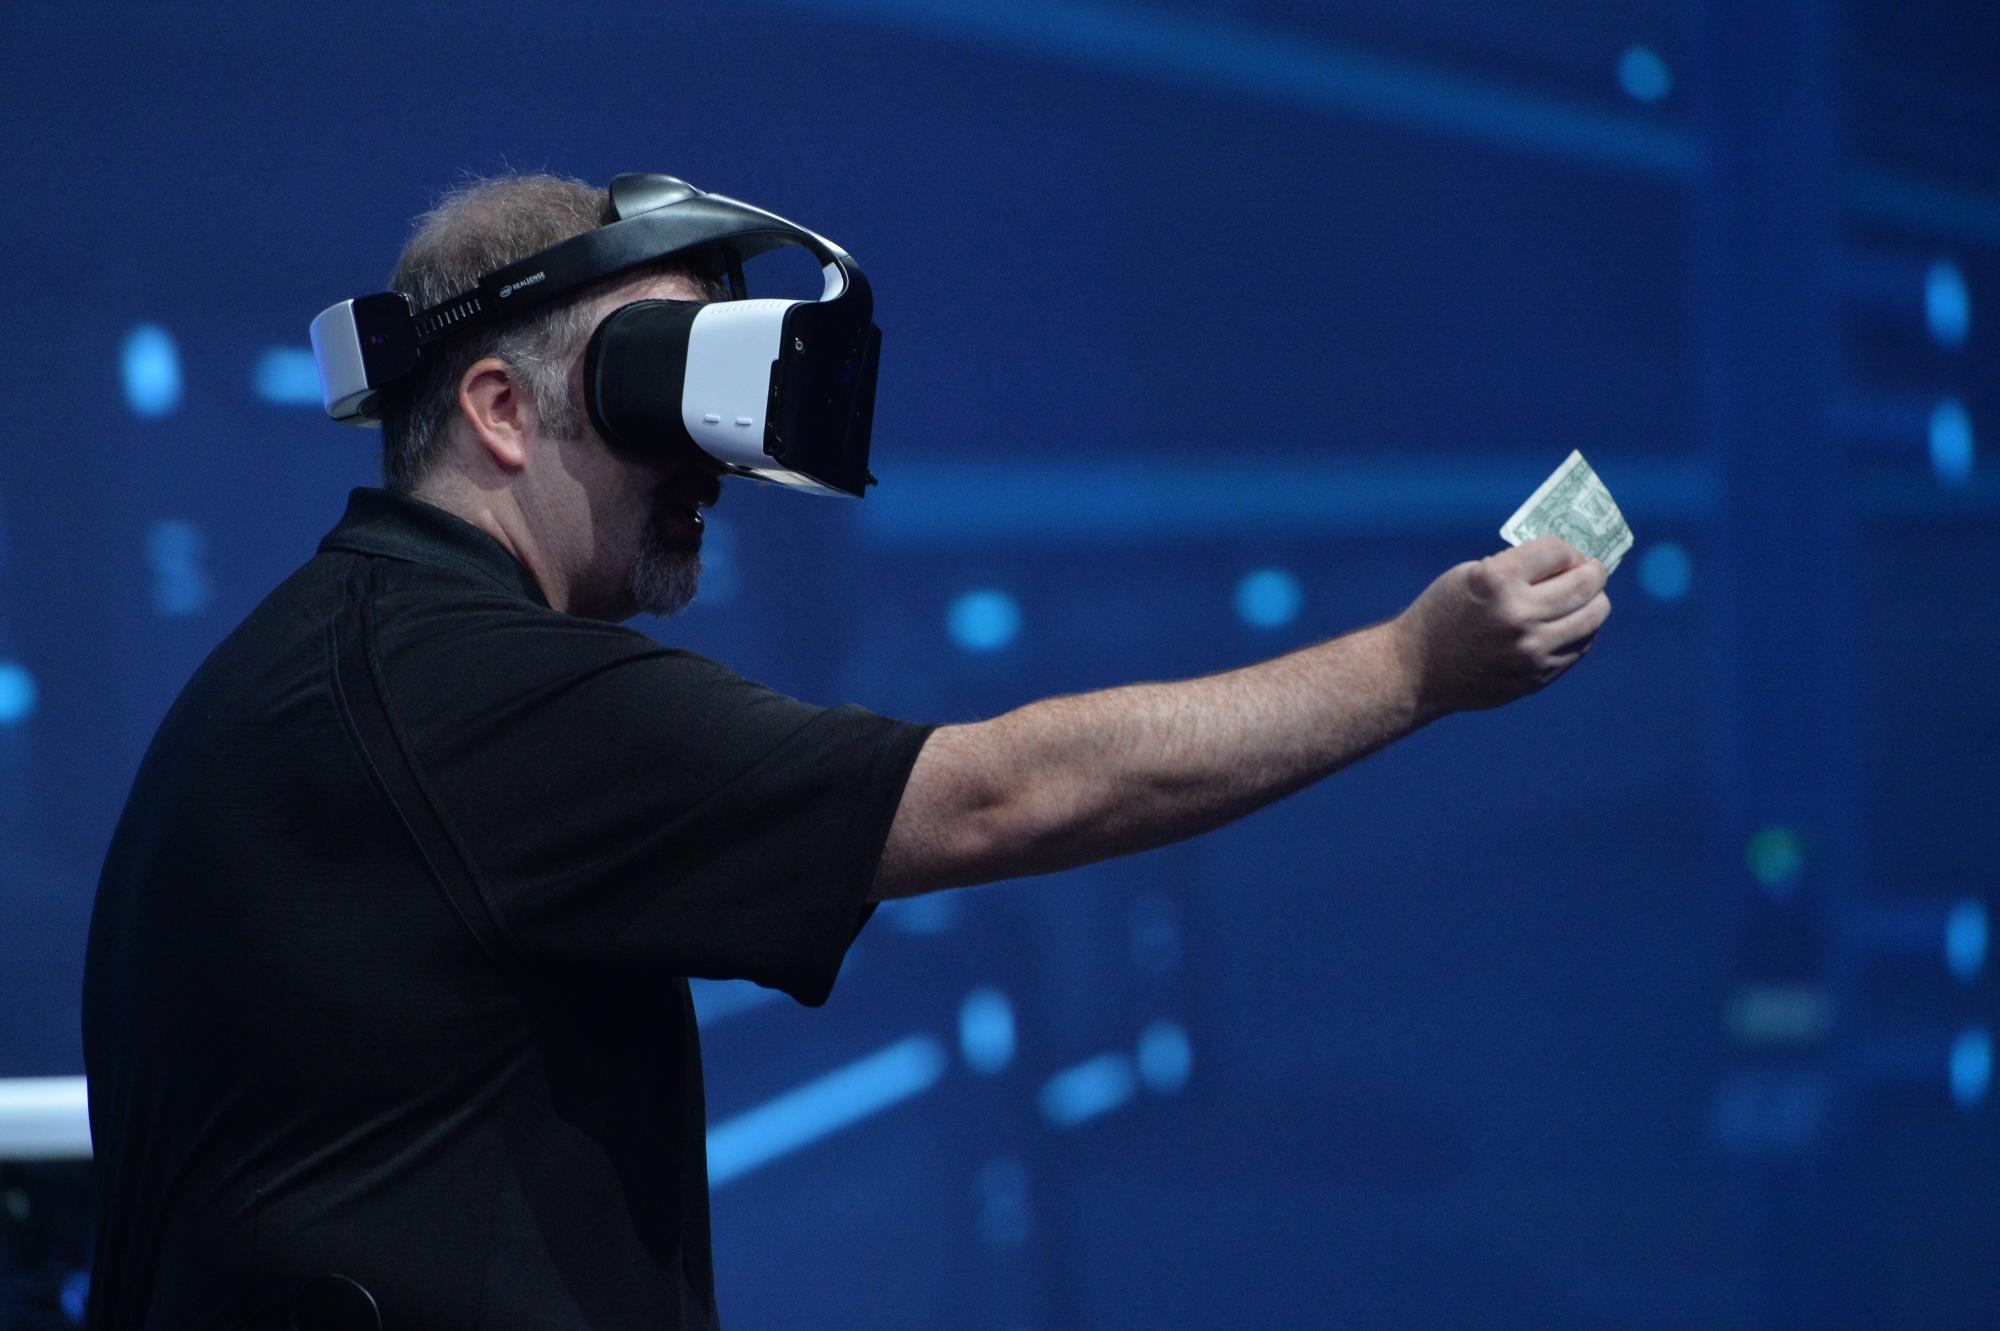 Intel, Project Alloy'u Durdurma Kararı Aldı